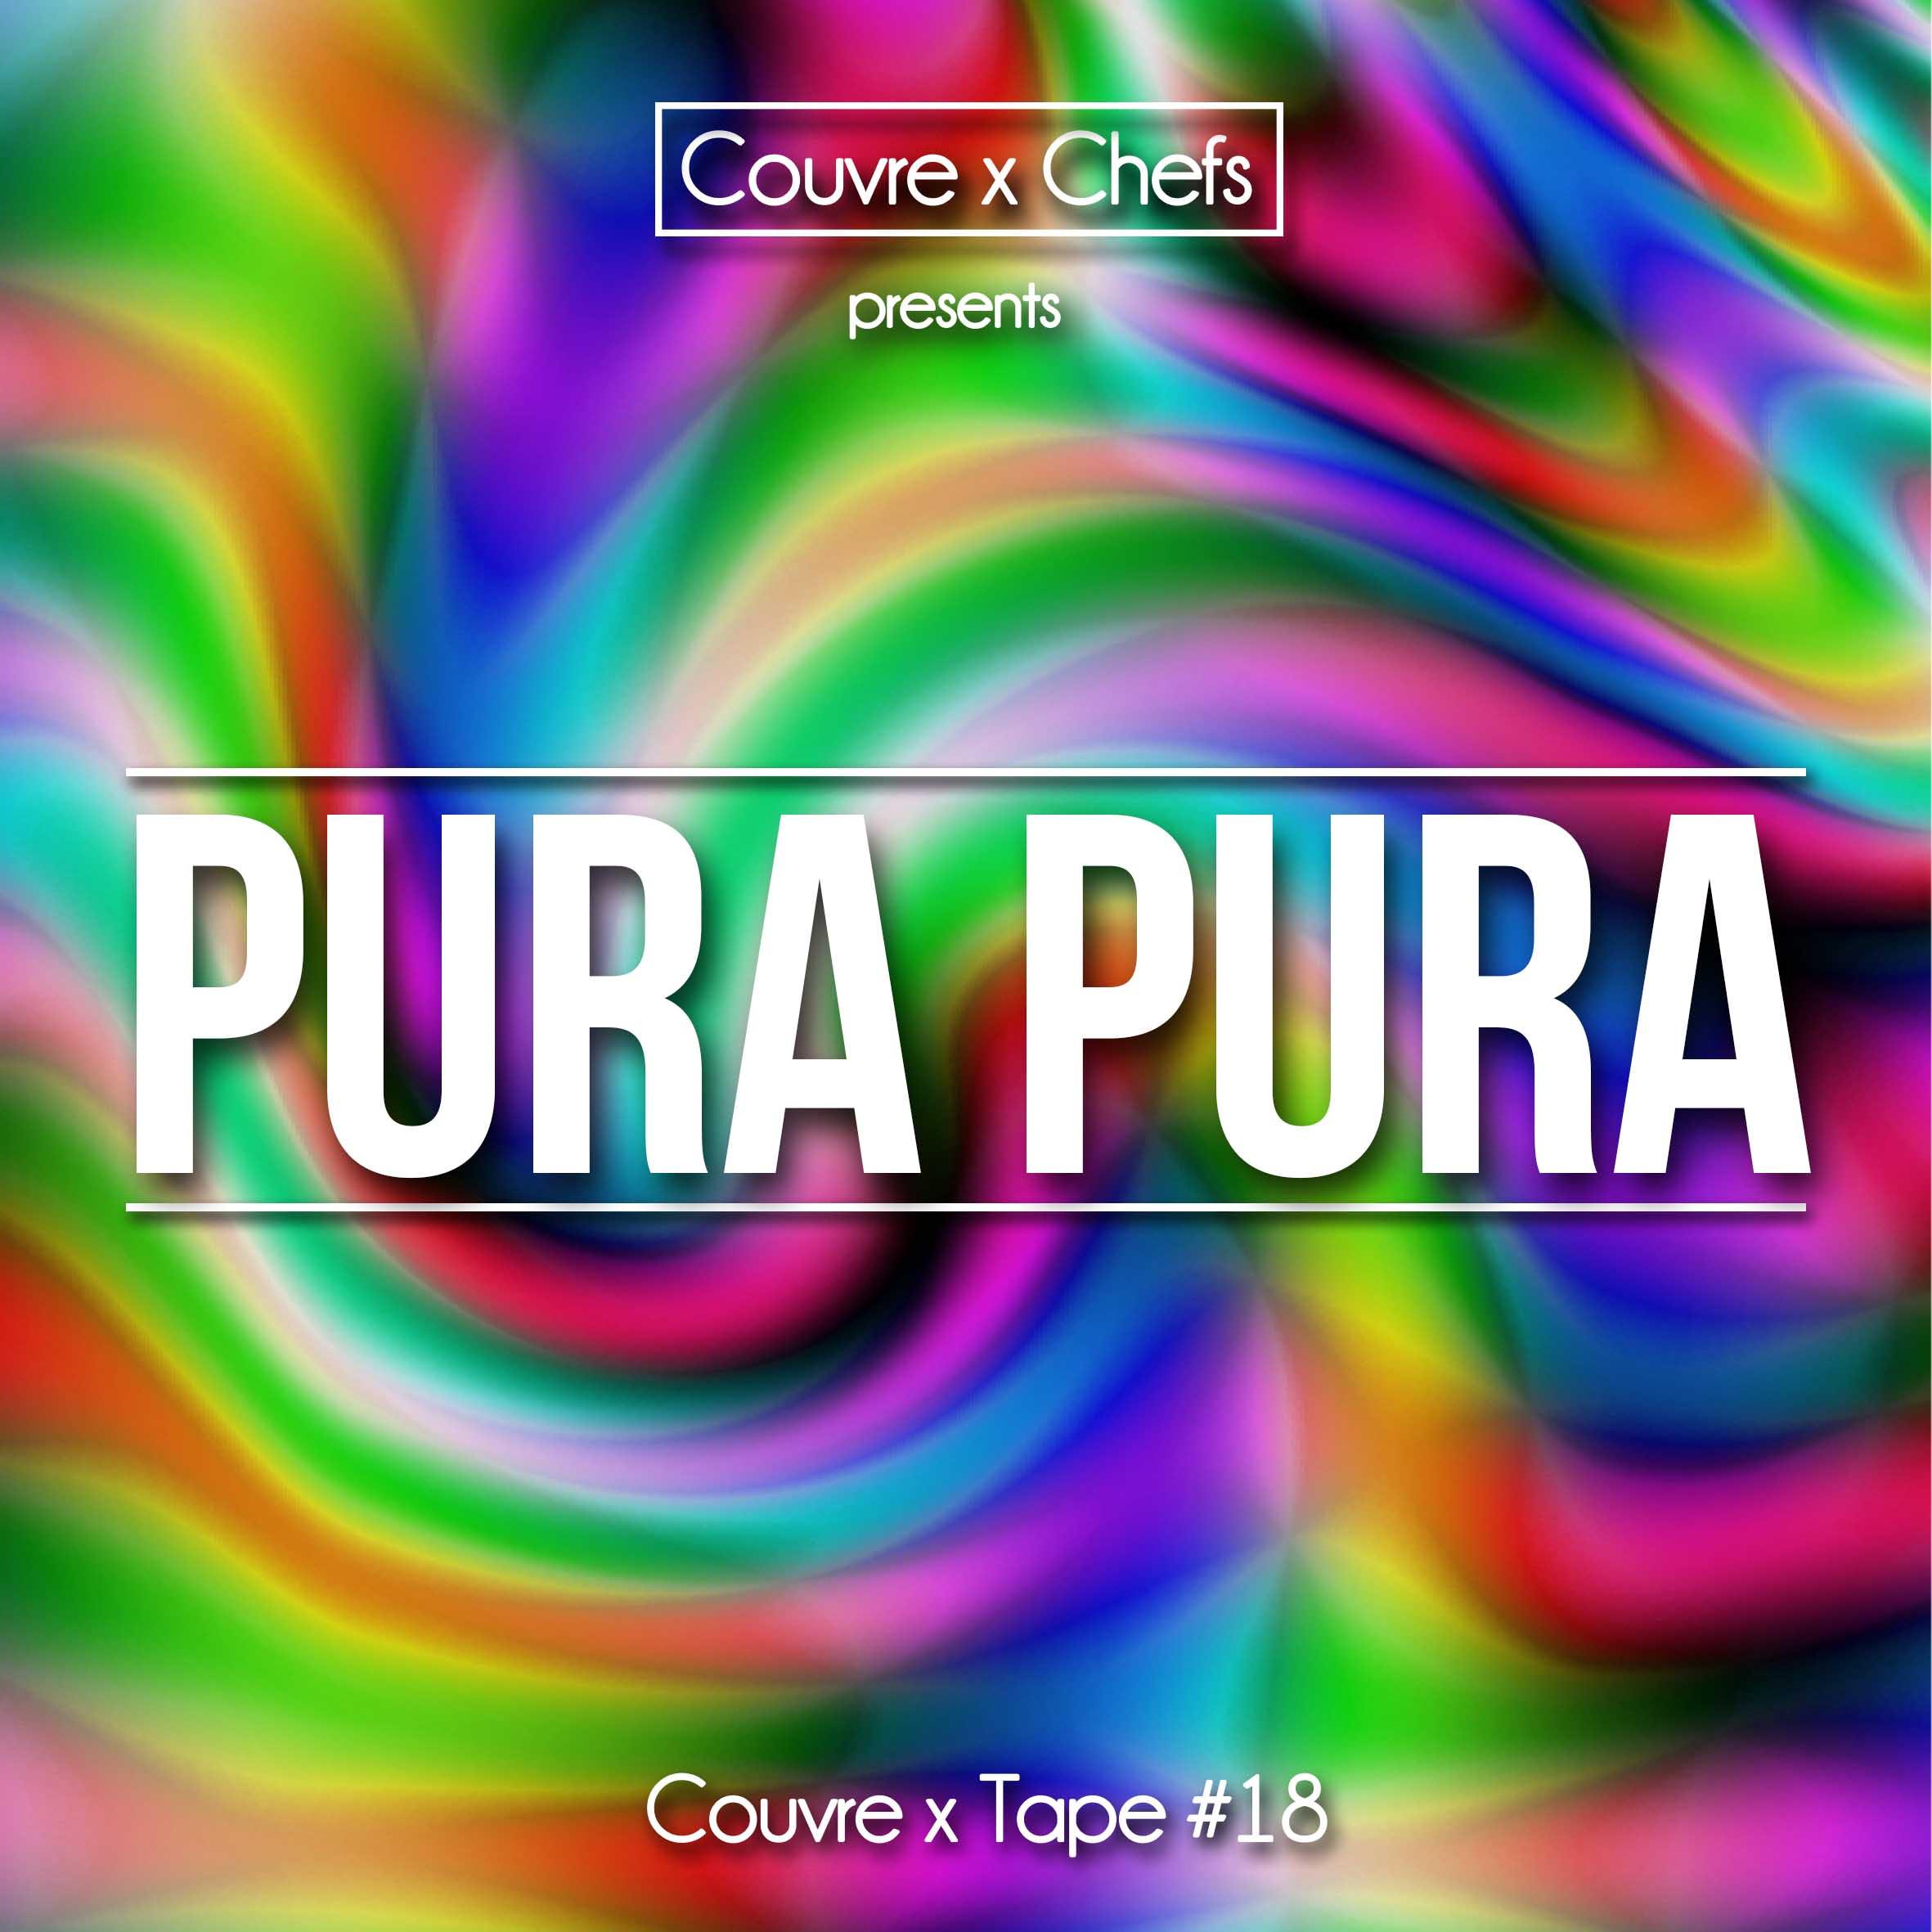 Couvre x Tape #18 Pura Pura